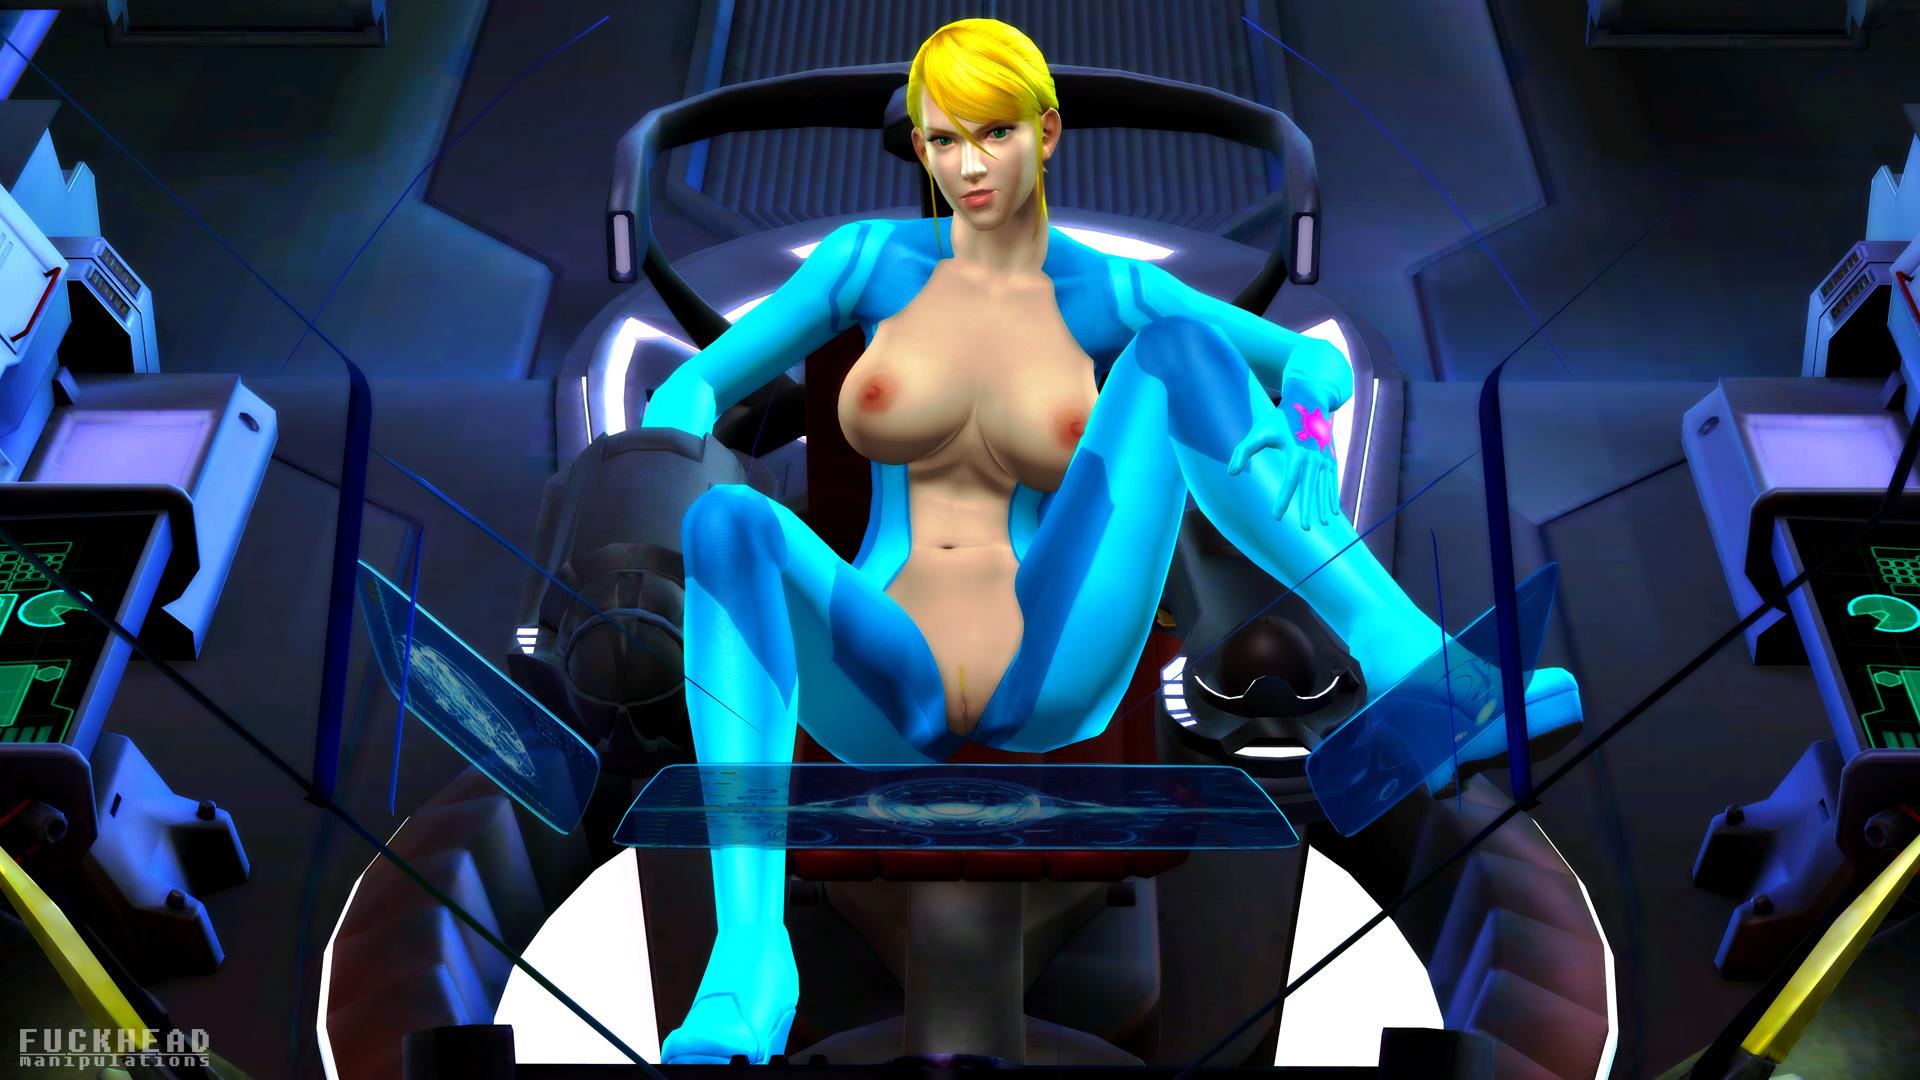 Metroid nackt sex erotic photo